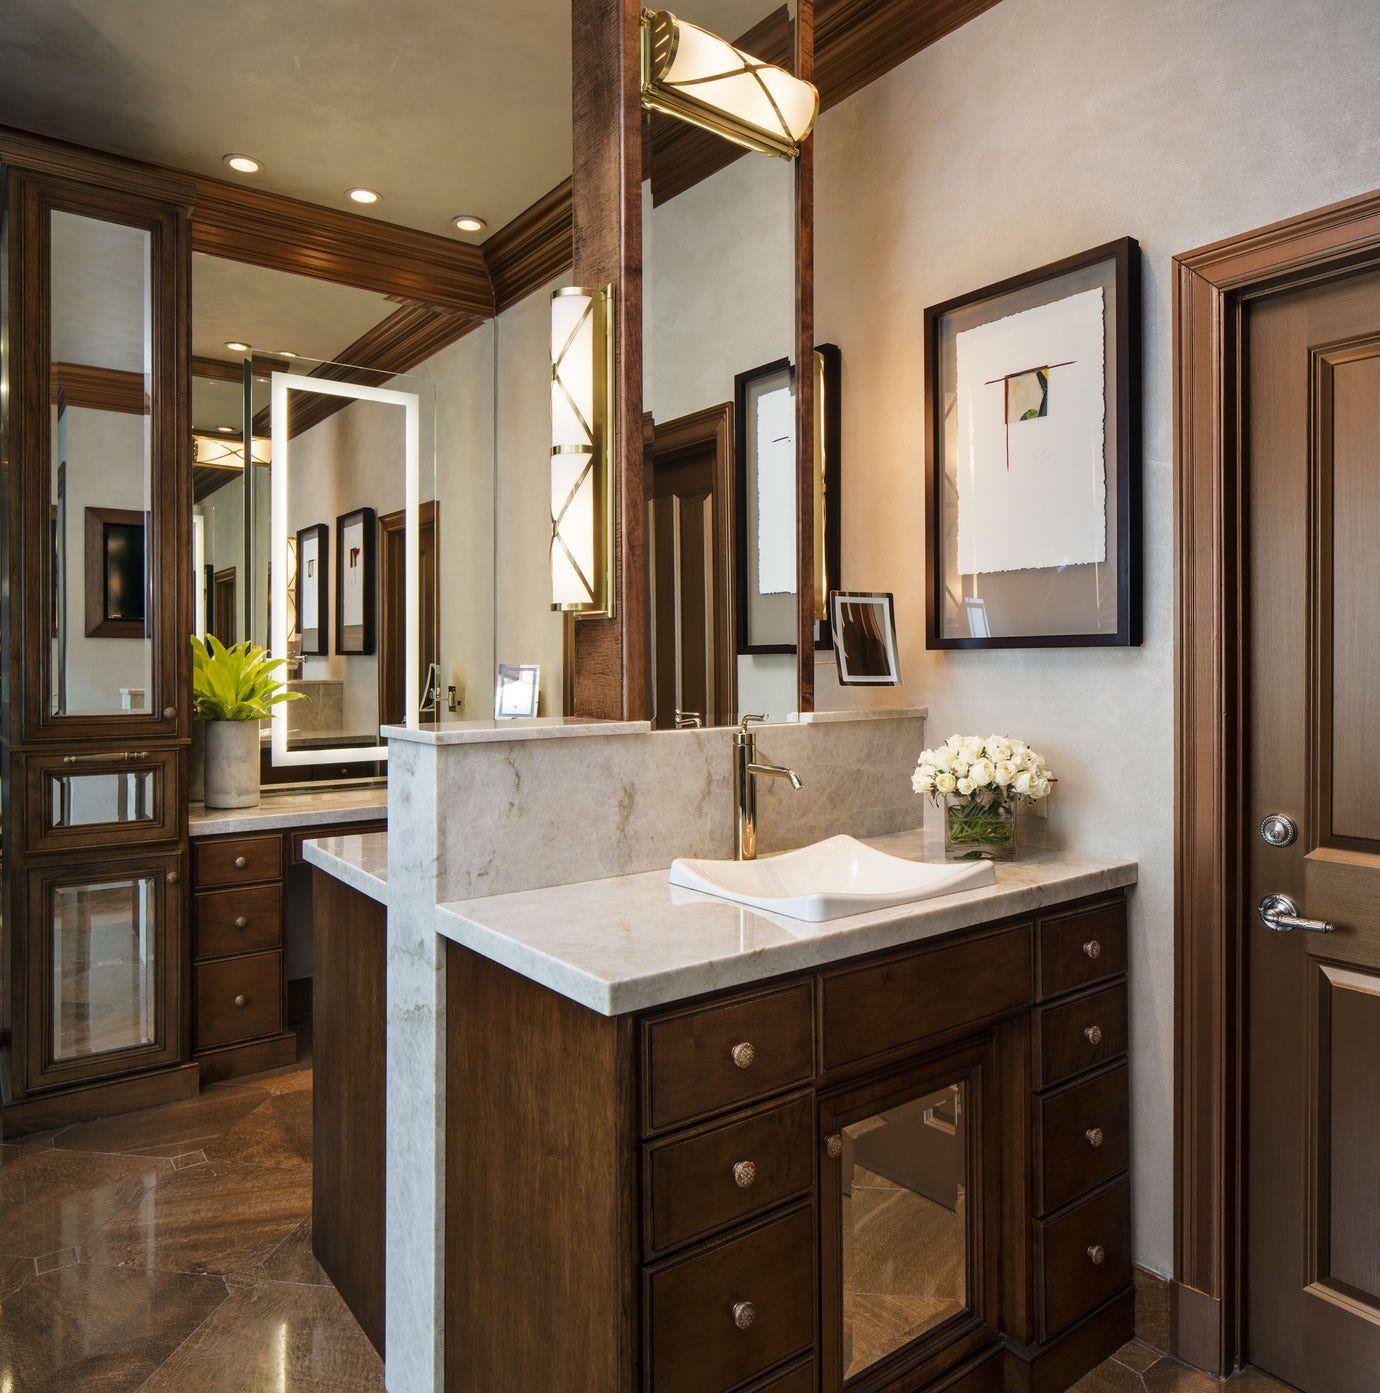 Elegant Transitional House, Master Bathroom Covered in ...